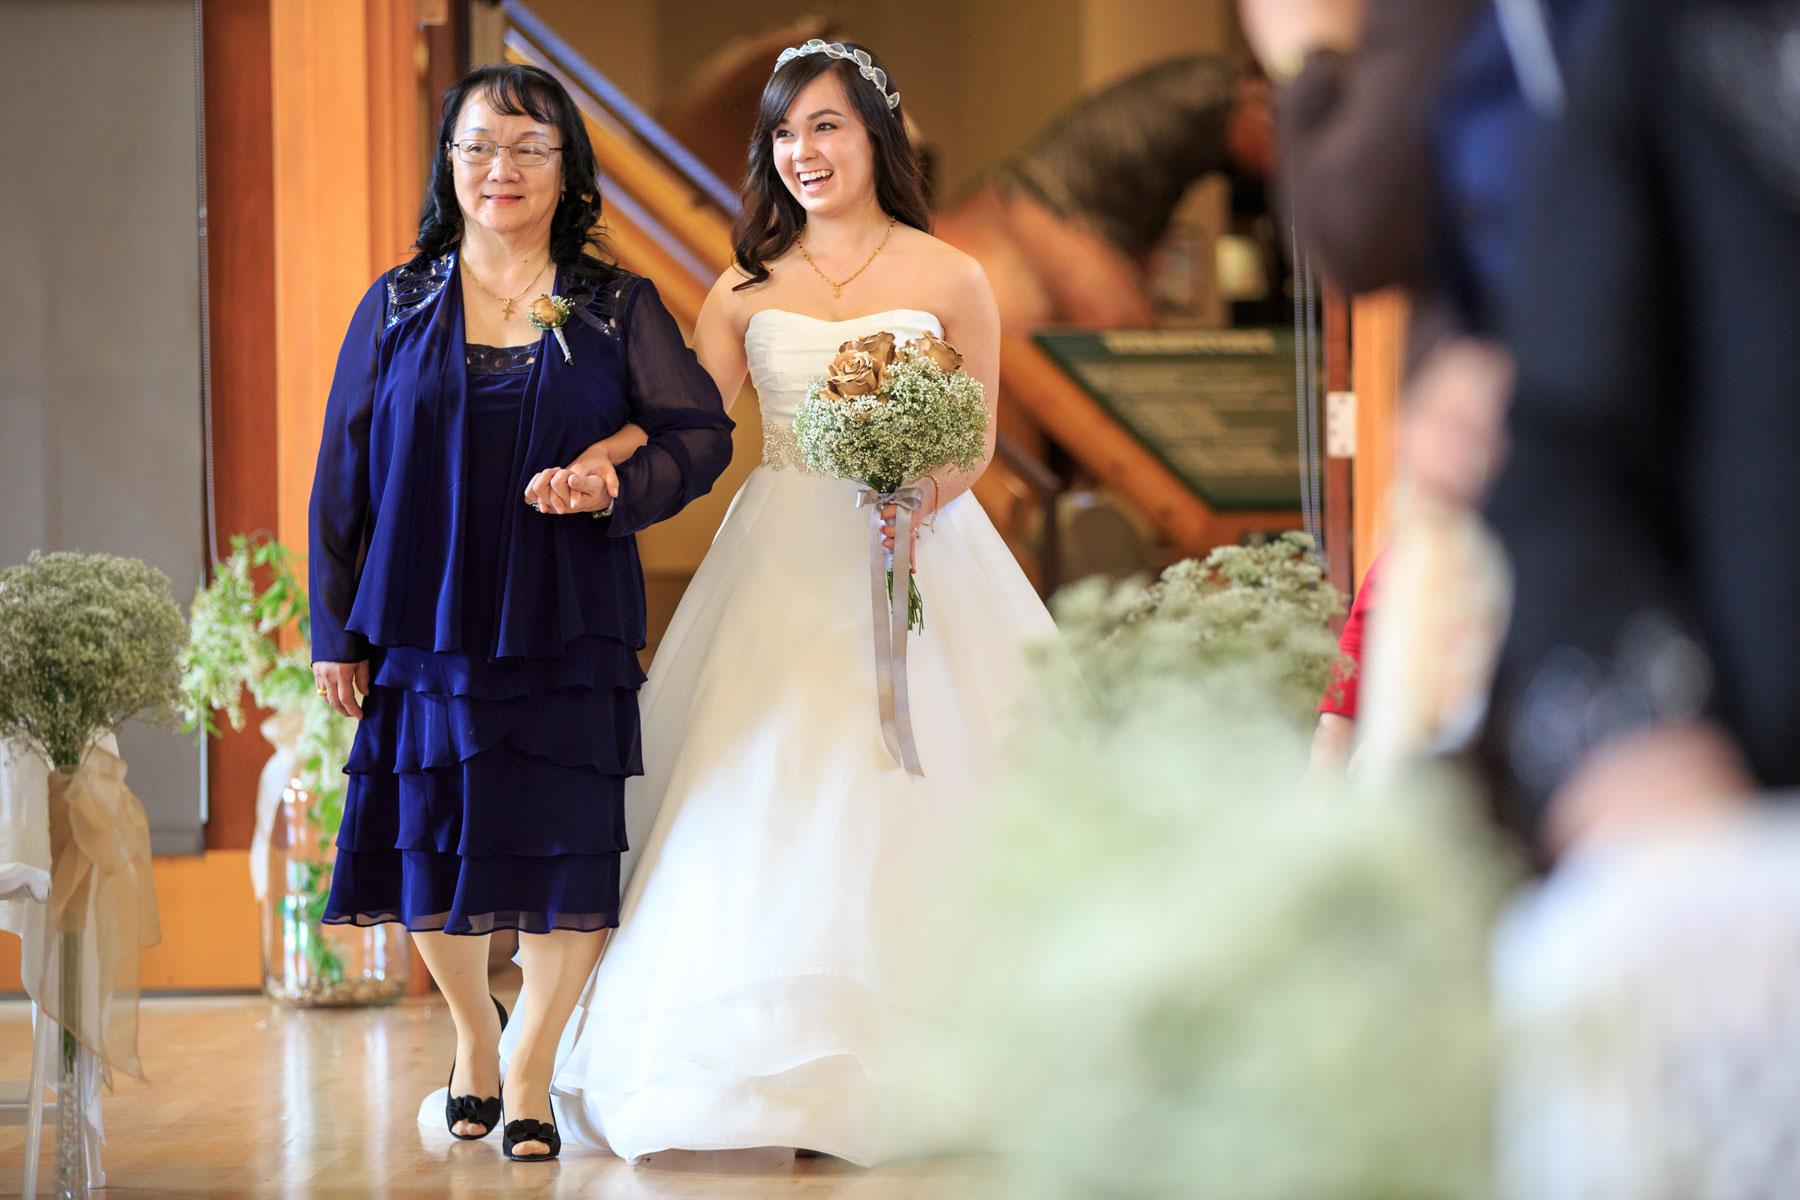 Tina-&-Jordan-Calgary-Wedding-Cochrane-Wedding-Cochrane-Ranchehouse-Olson-Studios-(17)